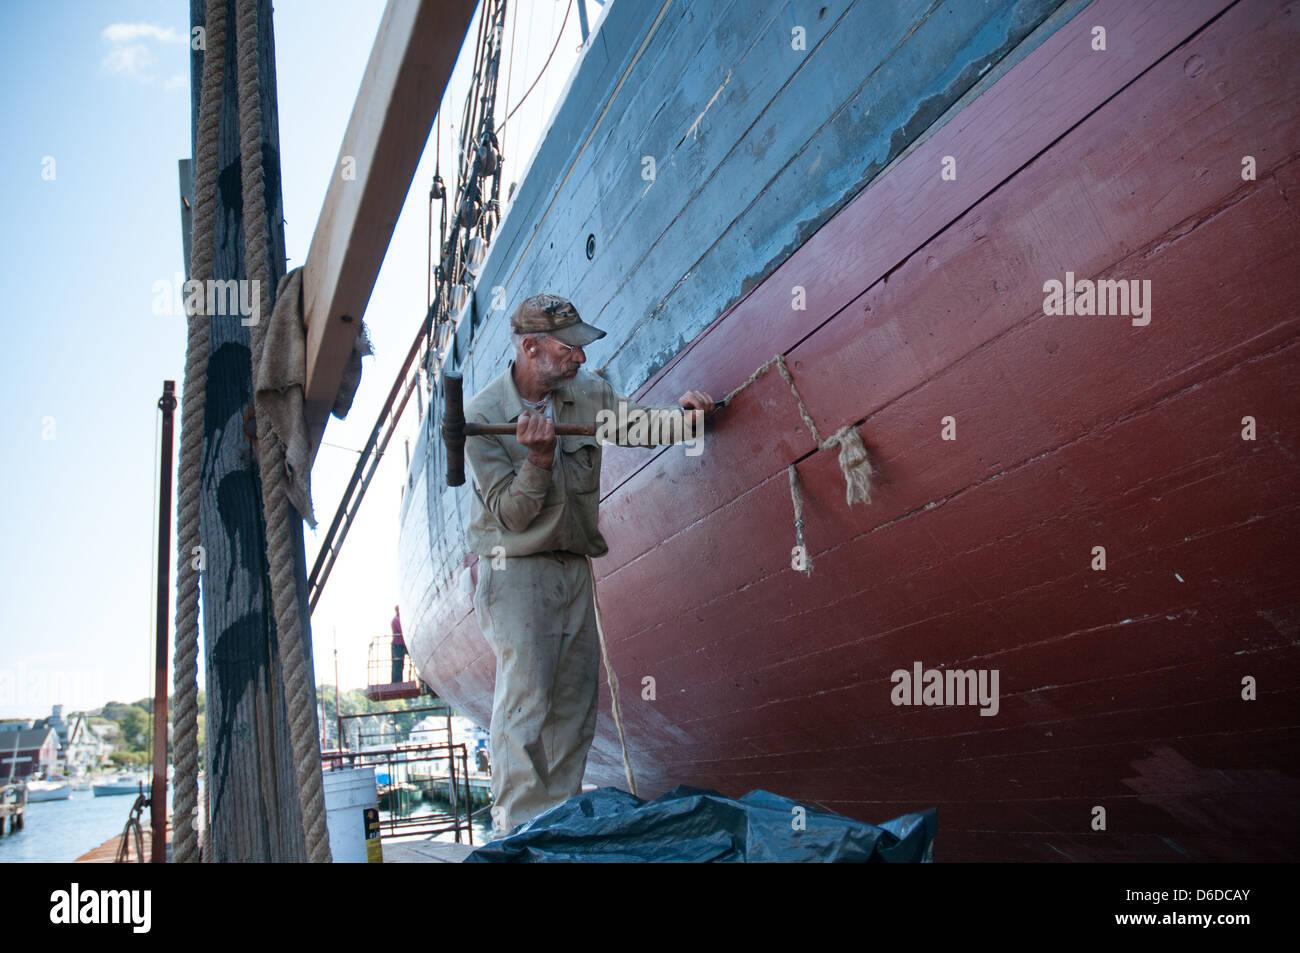 A shipyard worker hammers 'oakum' between the wooden boards in the hull of Schooner Highlander Sea. - Stock Image